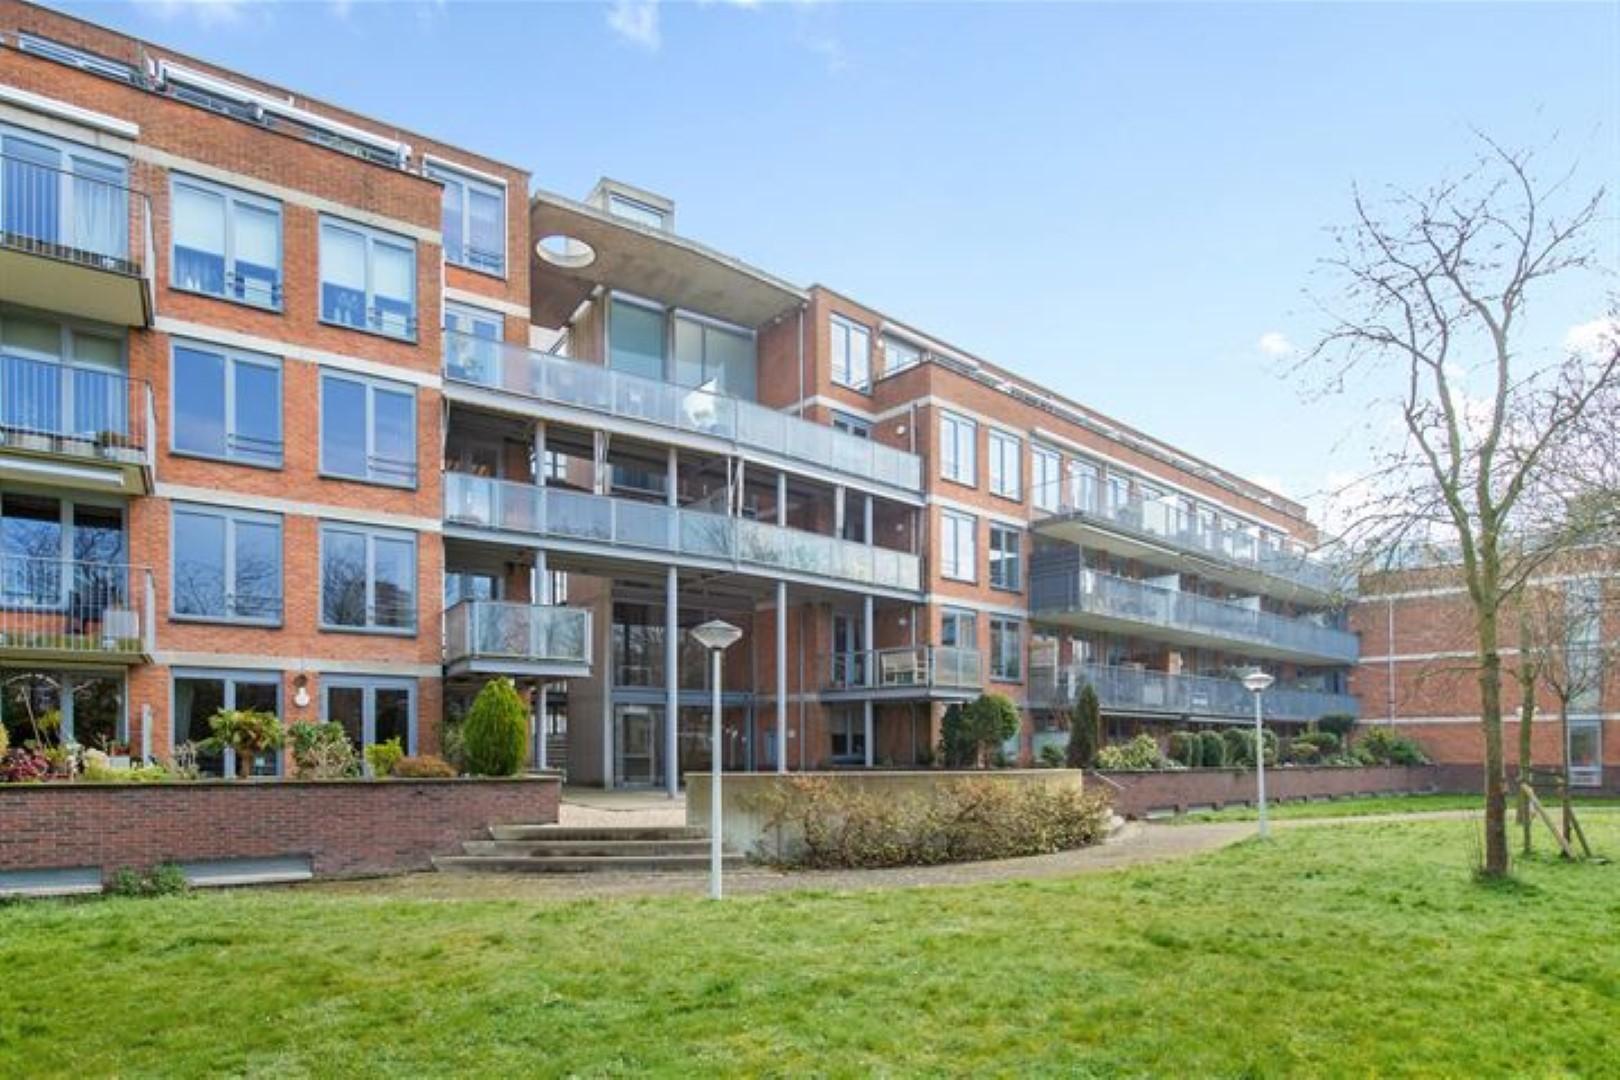 3-kamer appartement in Leiden Zuidwest Op loopafstand ligt het winkelcentrum Wagnerplein